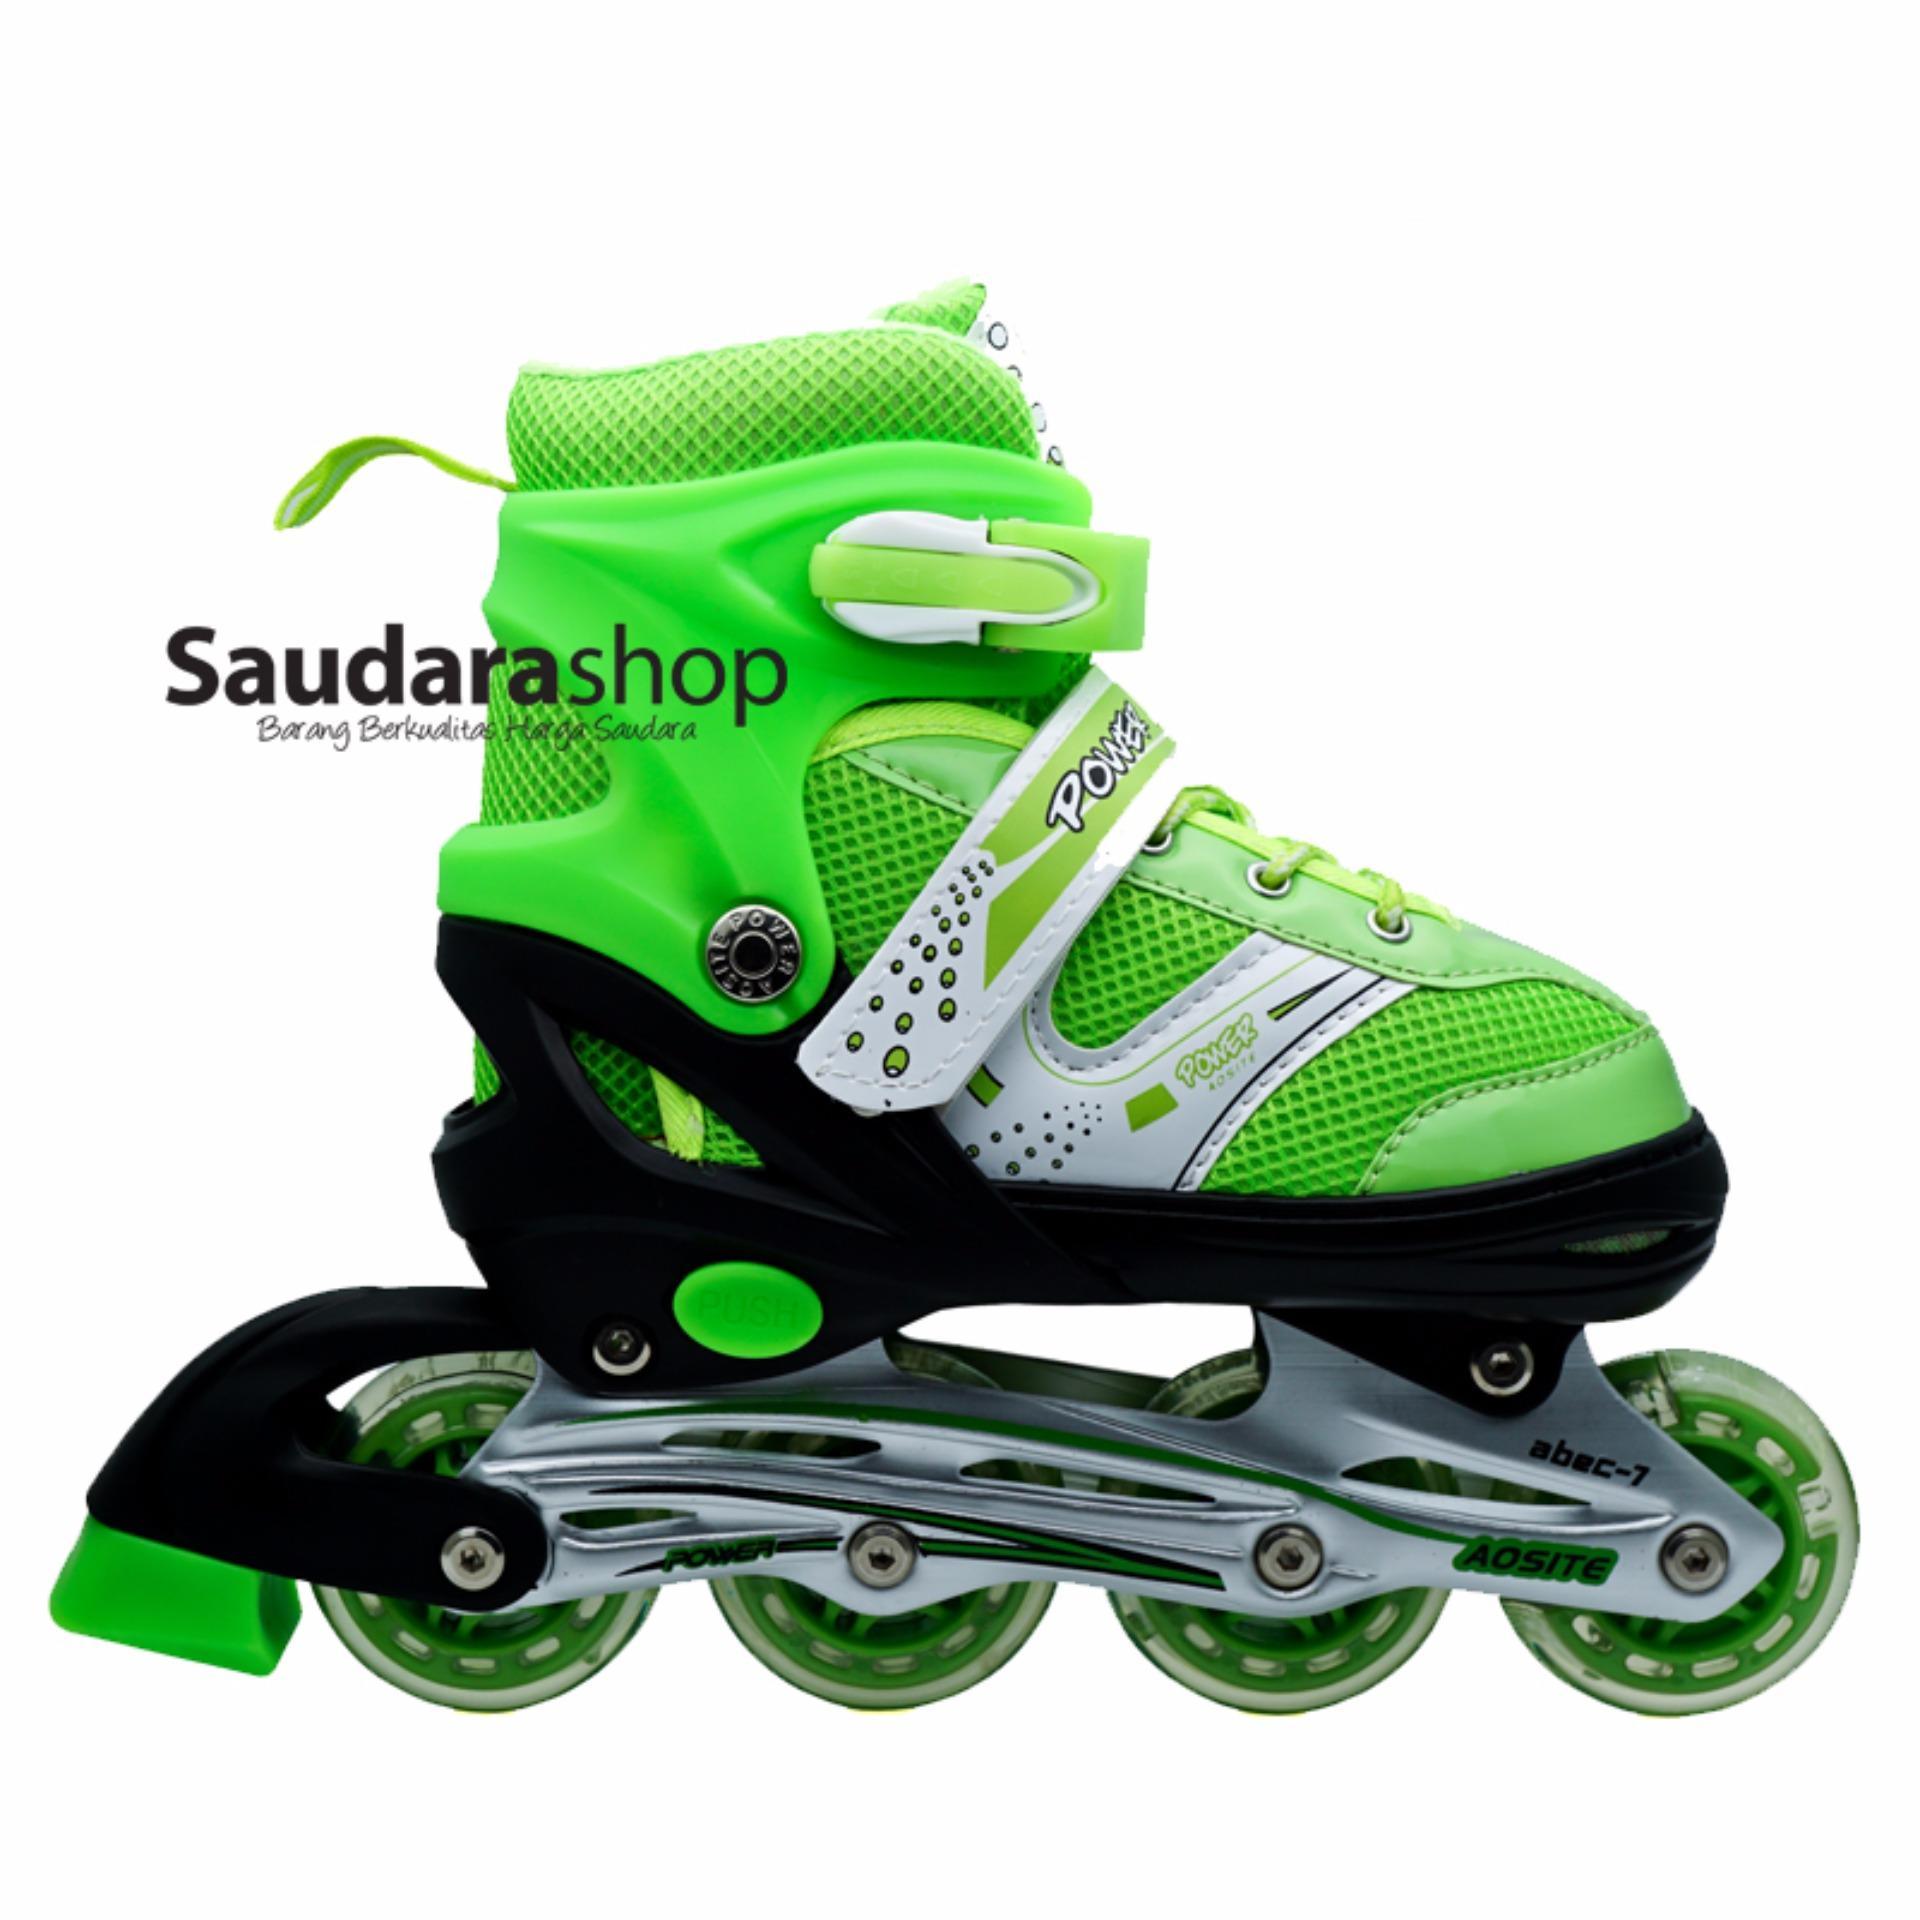 Power Sepatu Roda Inline Anak - Hijau   Sepaturoda Inline Skate Anak - Hijau f3f8f5fb5c